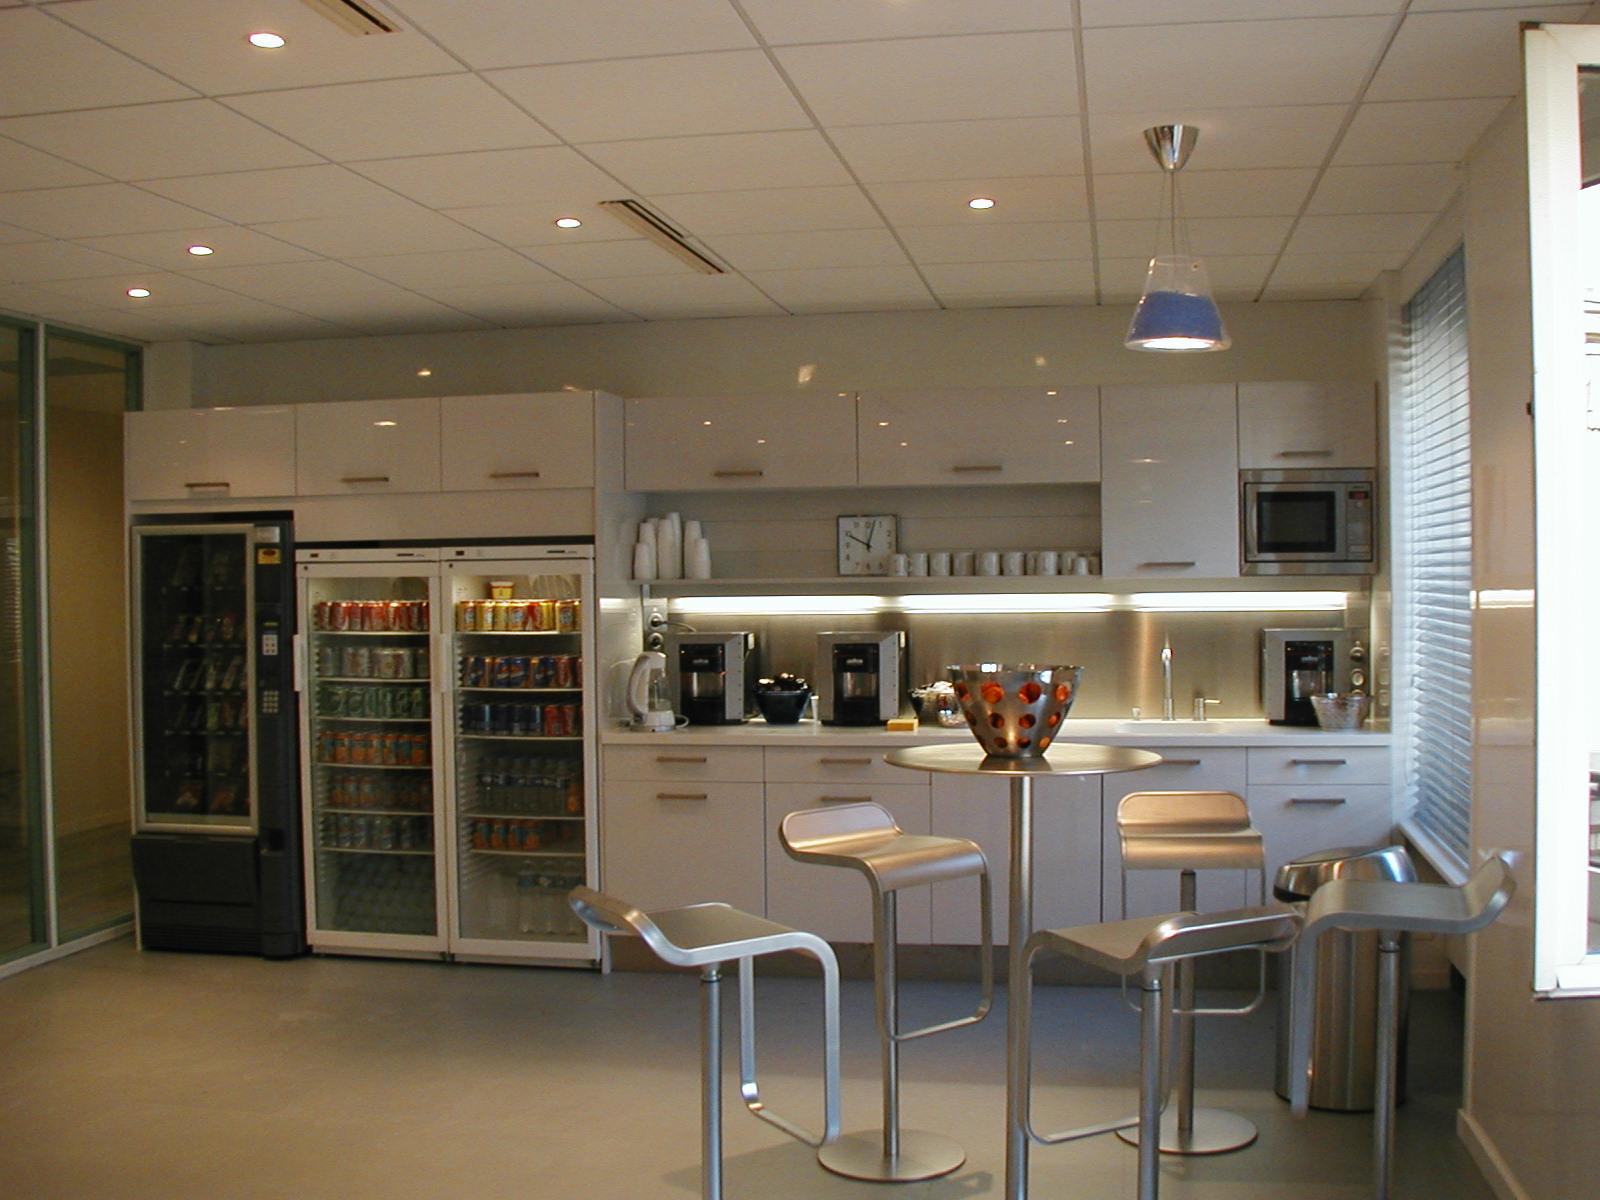 Espace cuisine bureau.JPG